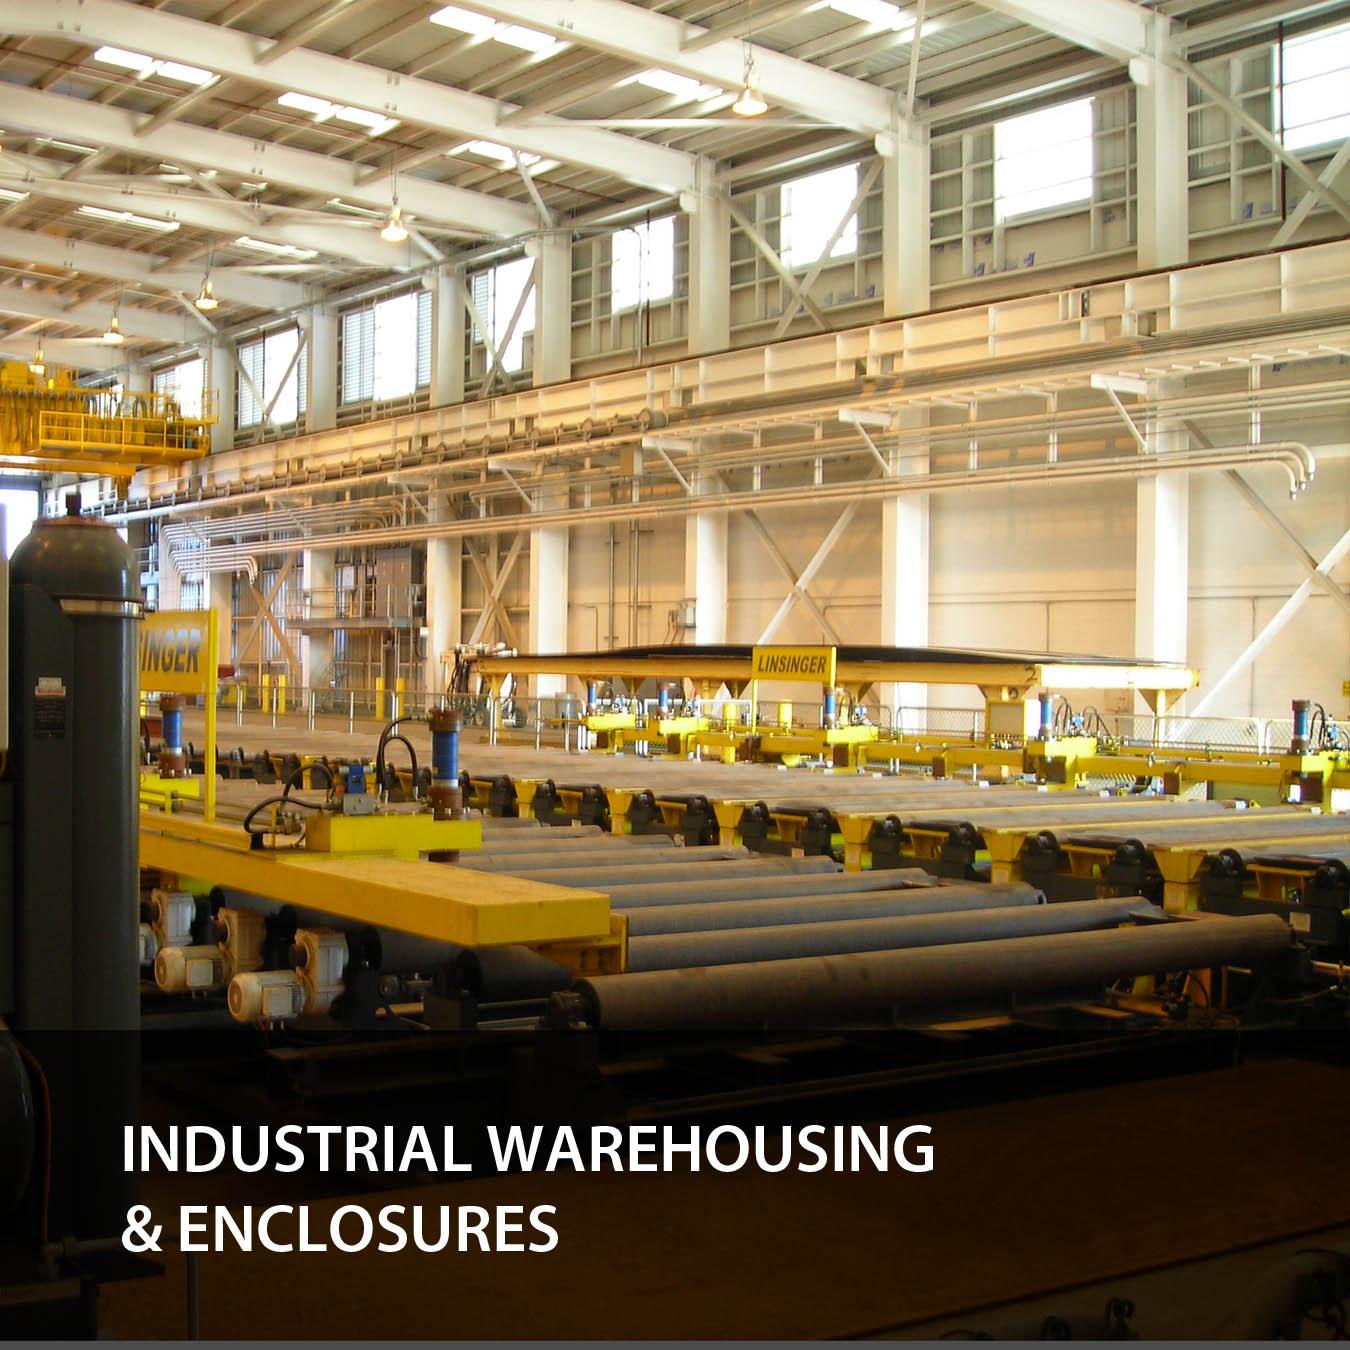 Industrial Warehousing & Enclosures